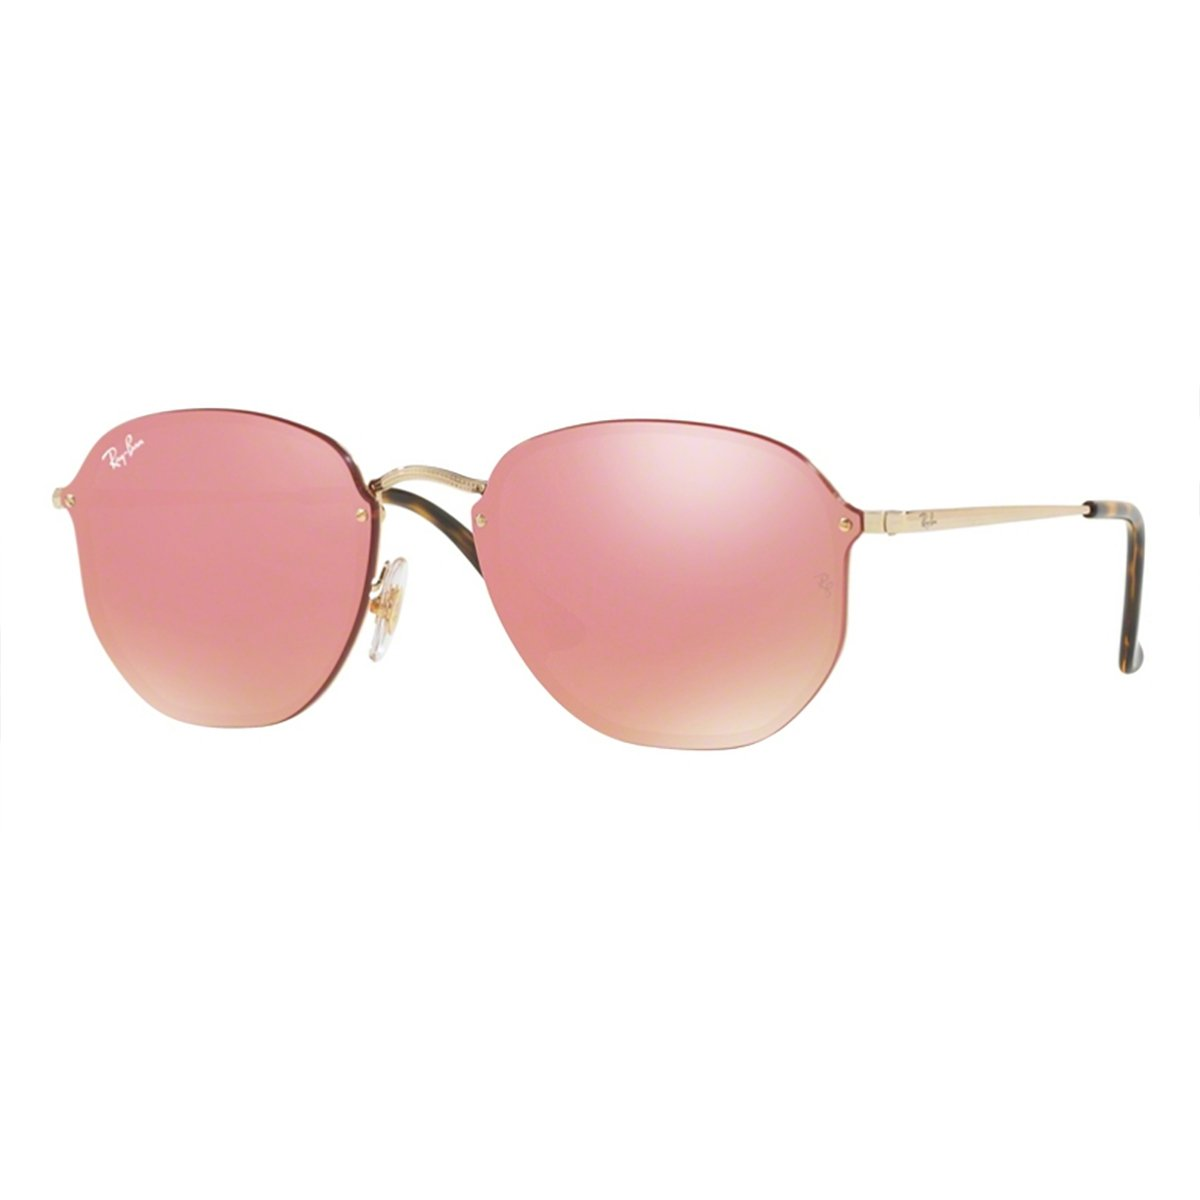 db6ae0428c01f Compre Óculos de Sol Ray Ban Blaze Hexagonal em 10X   Tri-Jóia Shop